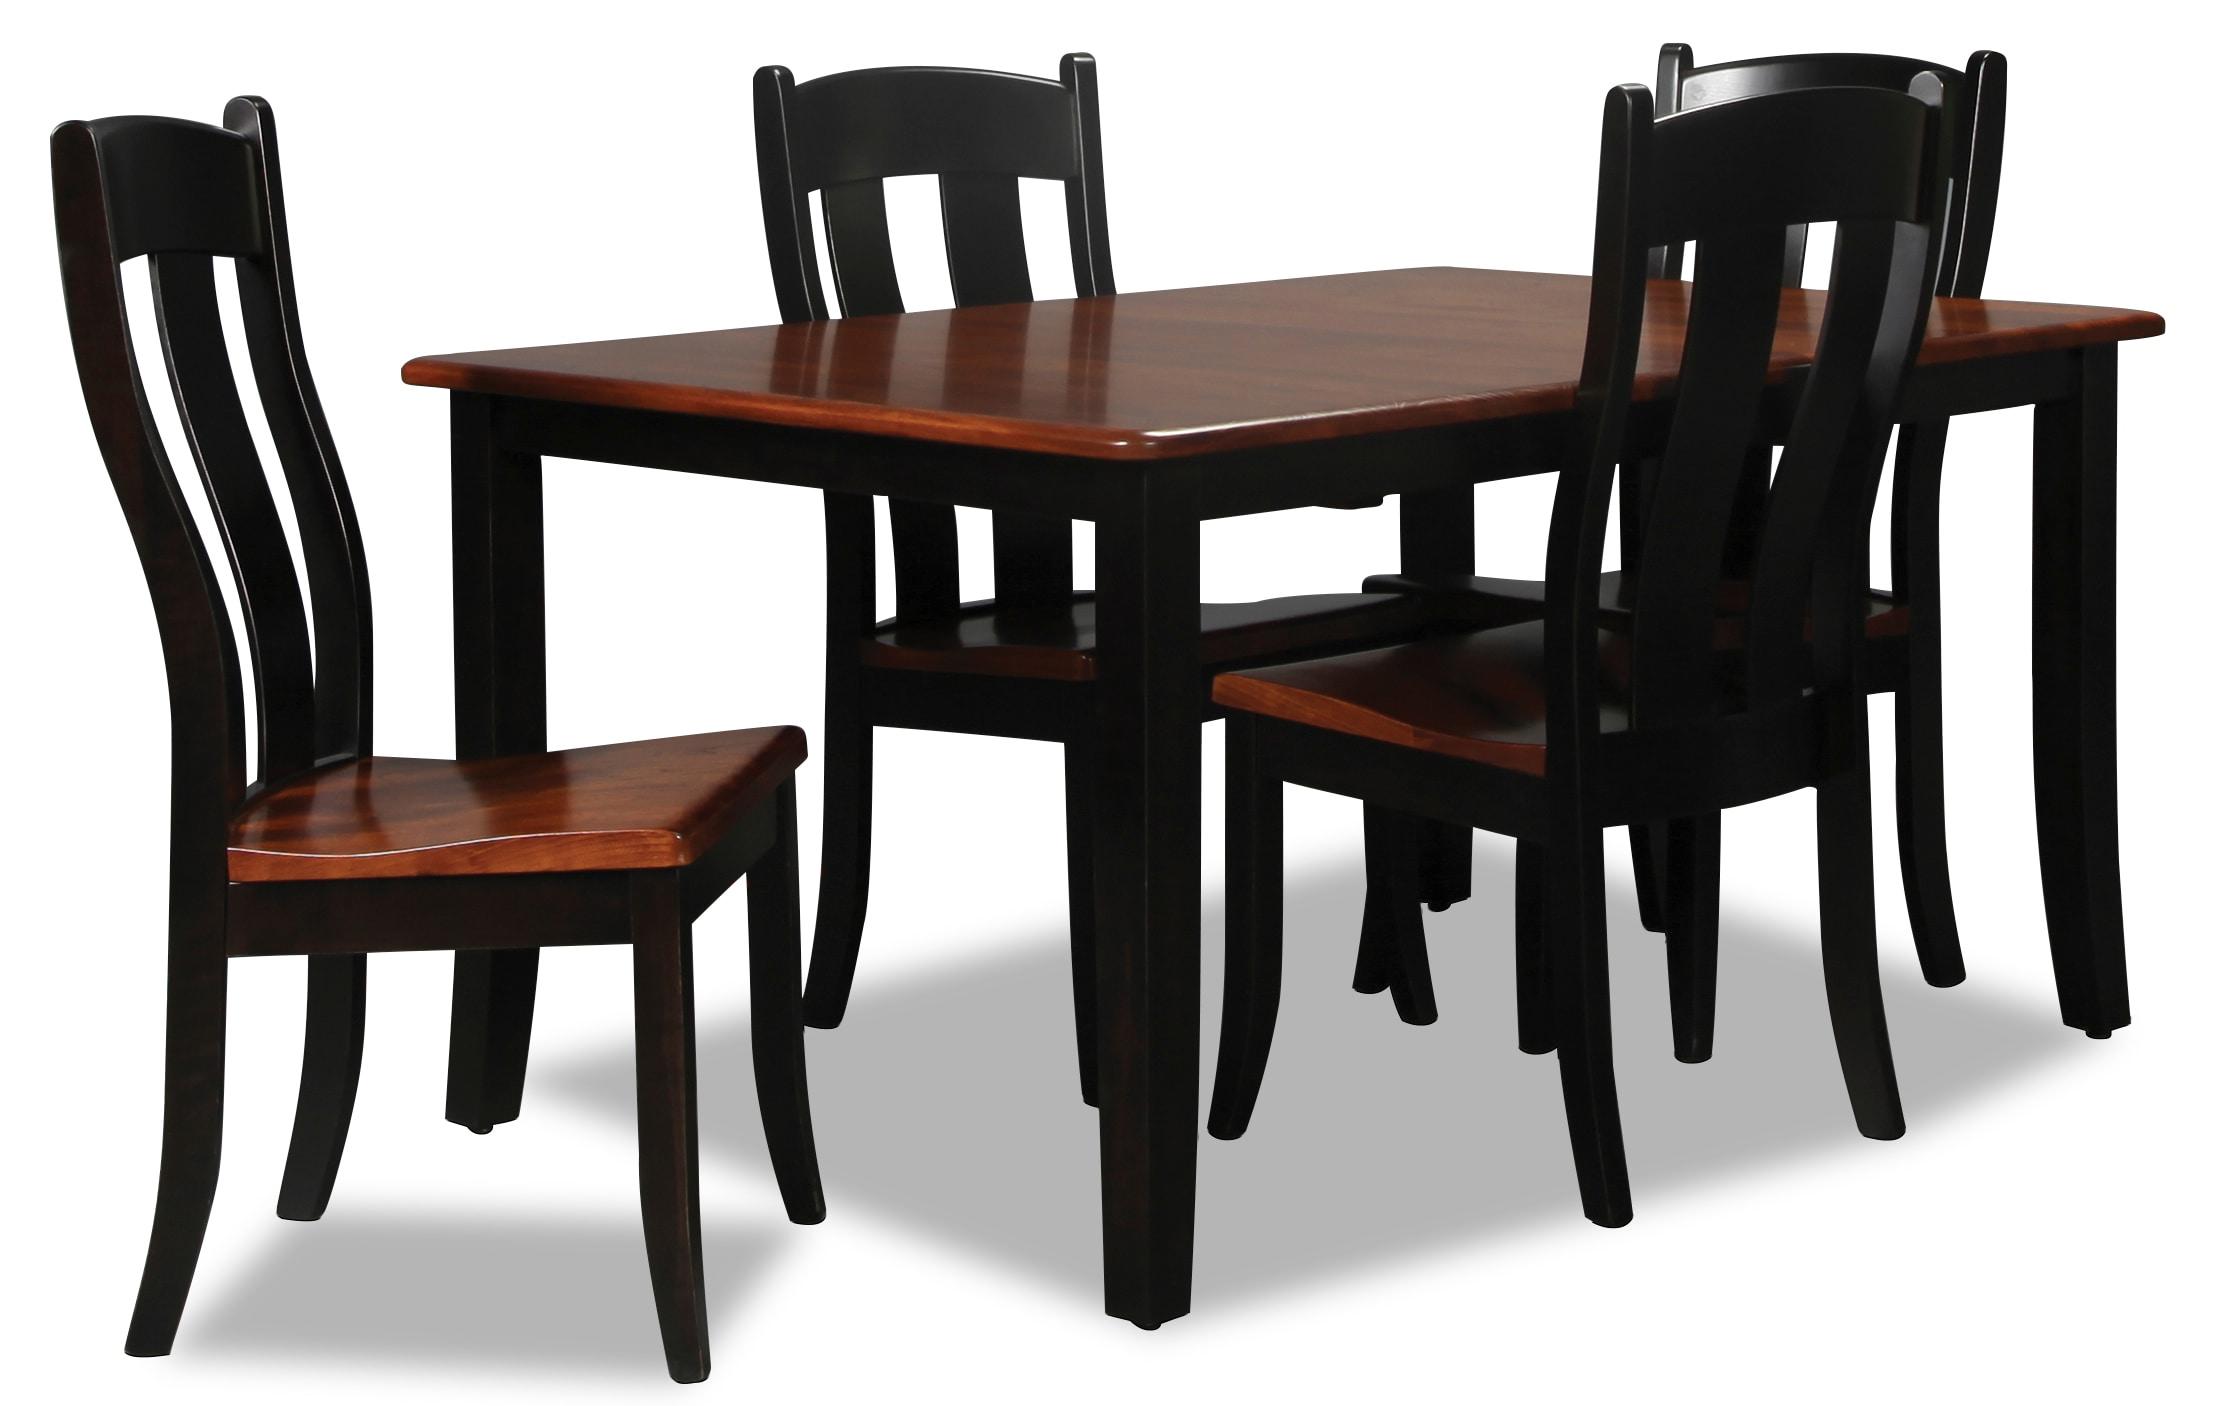 Kensley 5c Dining Set